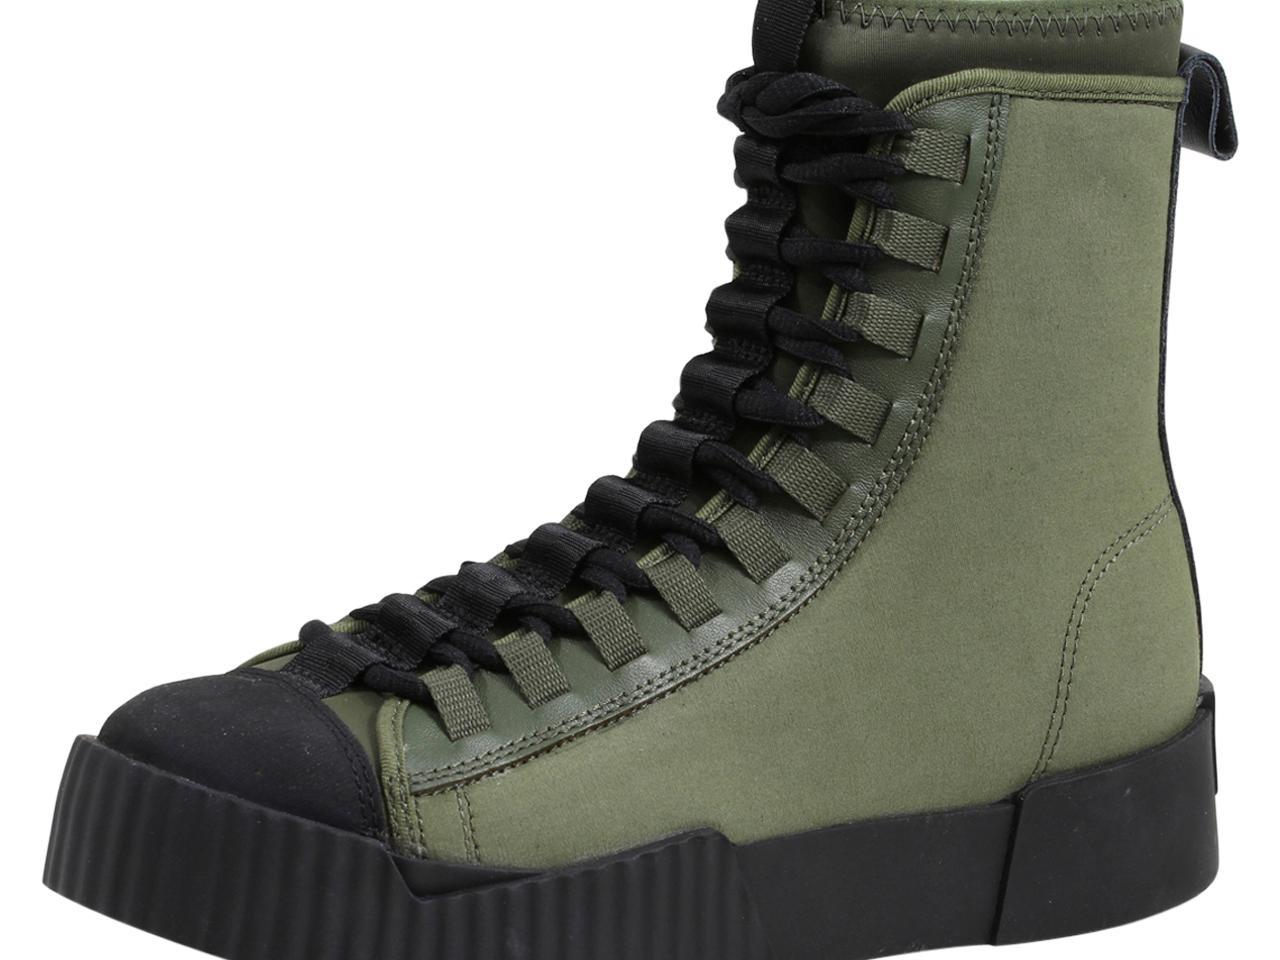 G Star Raw Men's Rackam Scuba II High High Top Sneakers Shoes